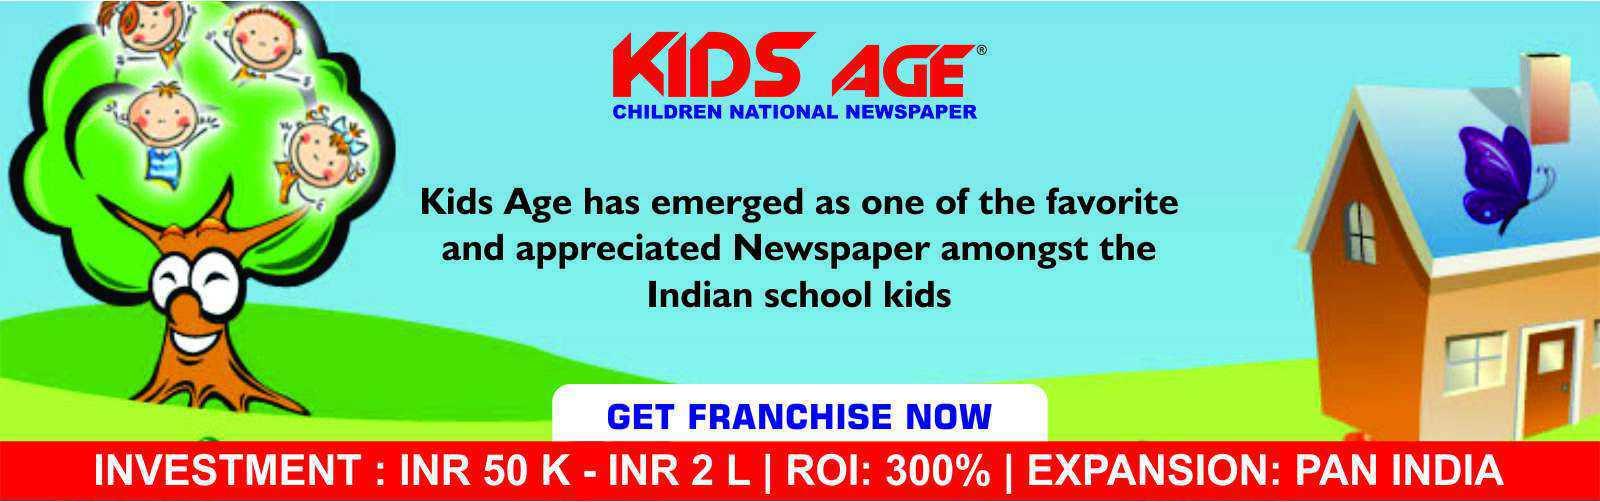 admin/photos/Kids Age